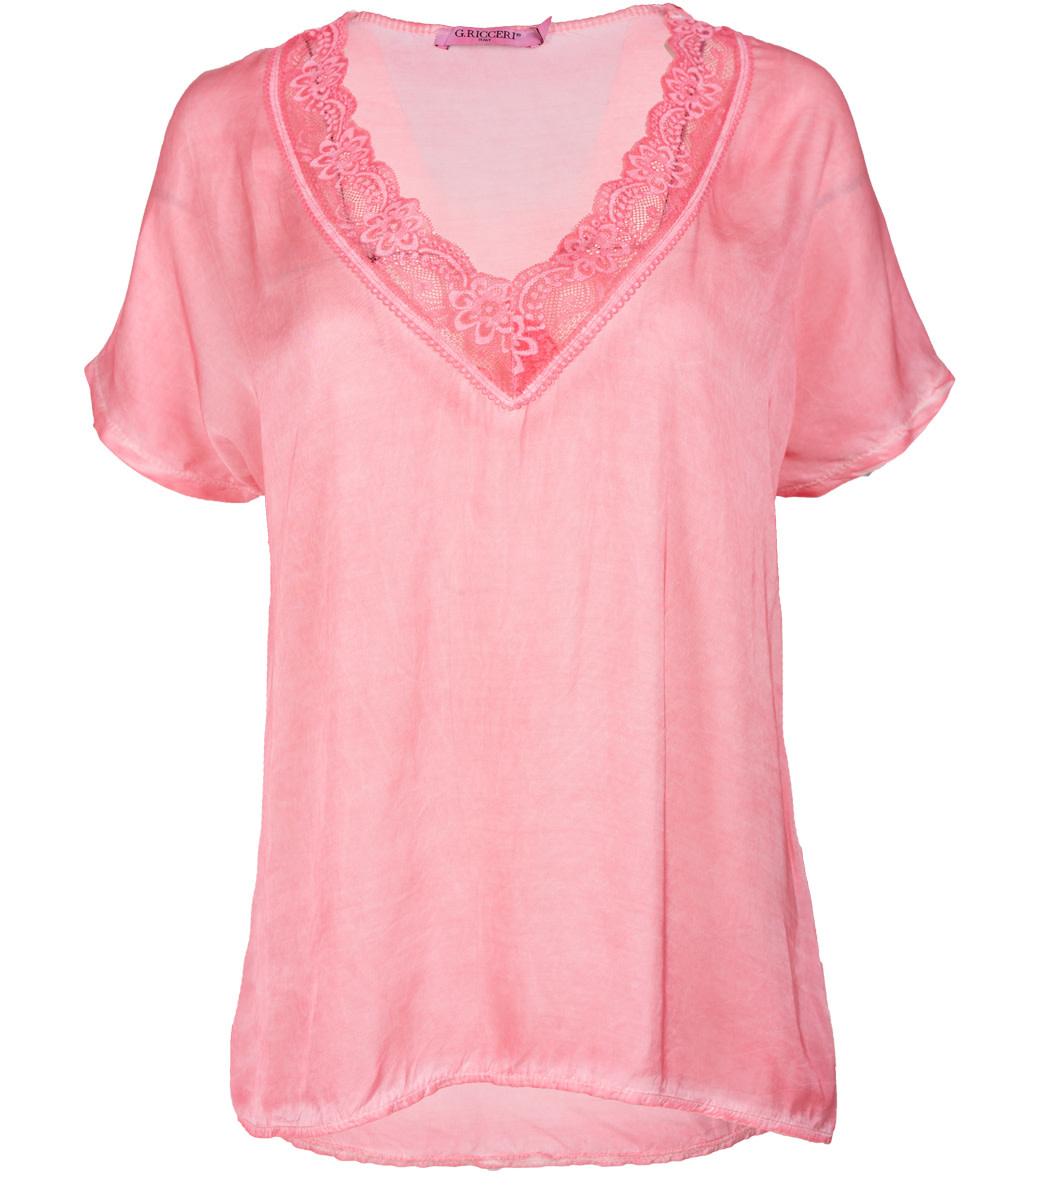 Gemma Ricceri Shirt satijn roze Anja